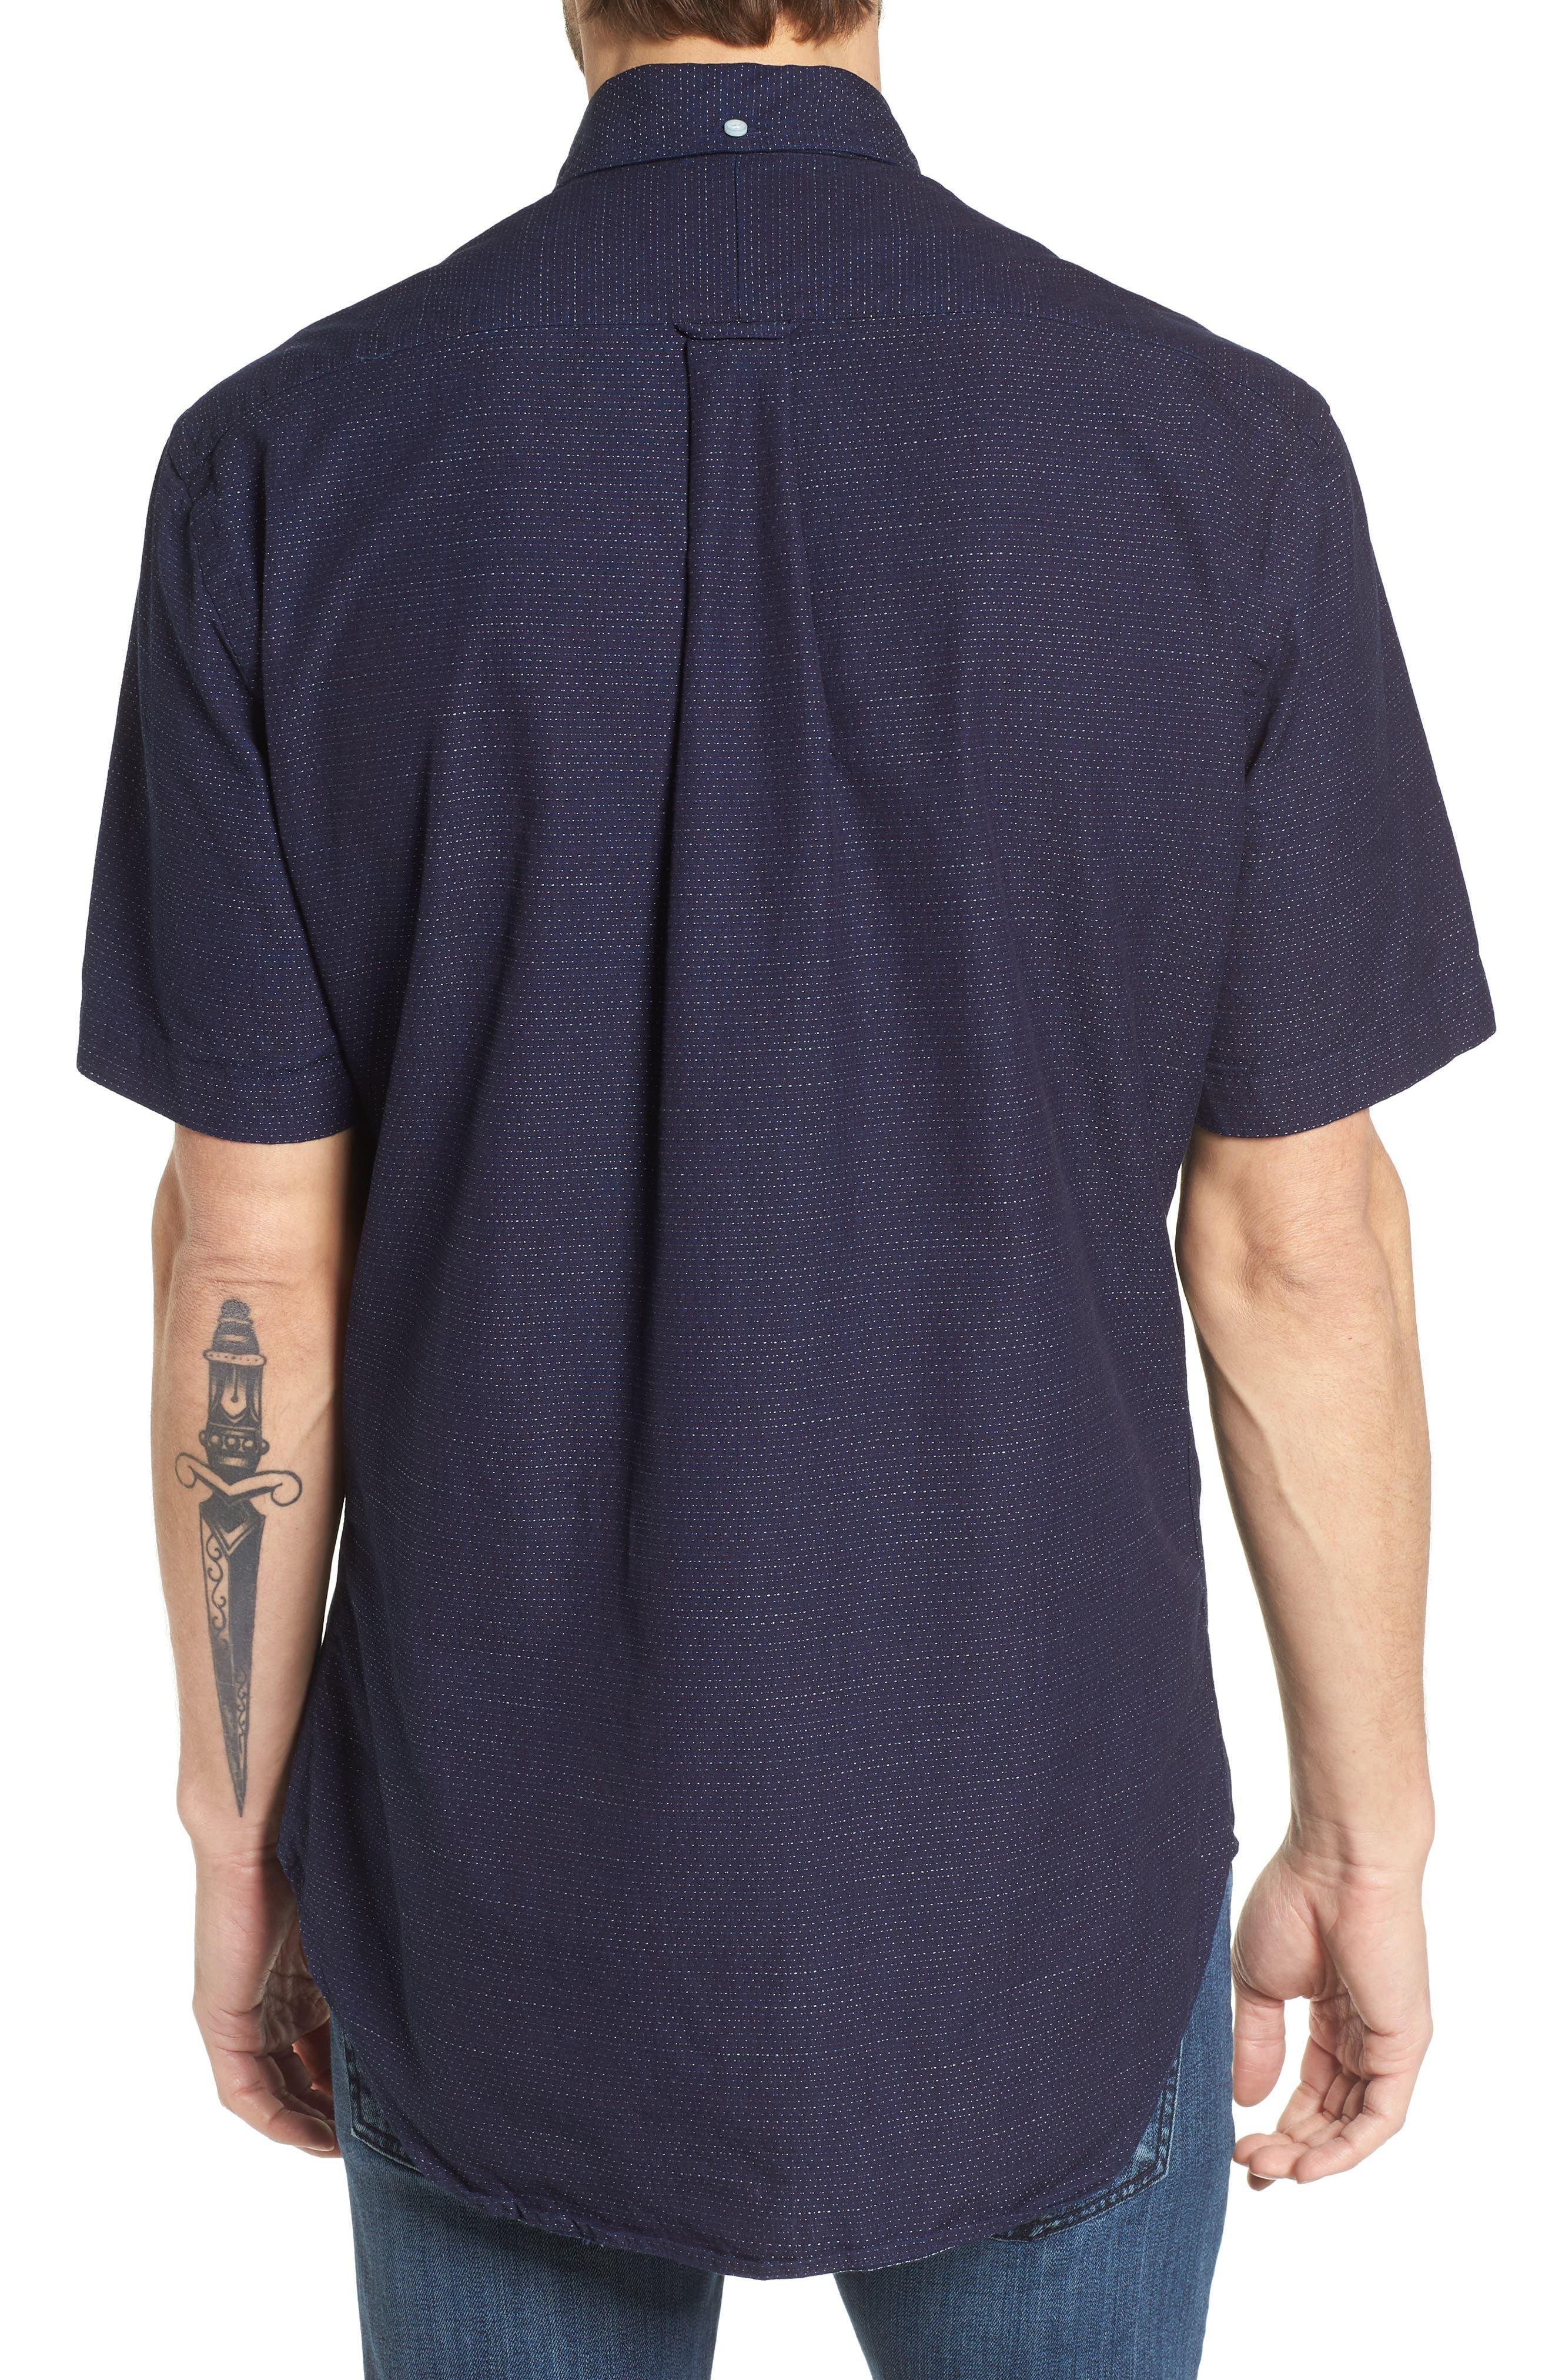 Camp Shirt,                             Alternate thumbnail 3, color,                             Navy